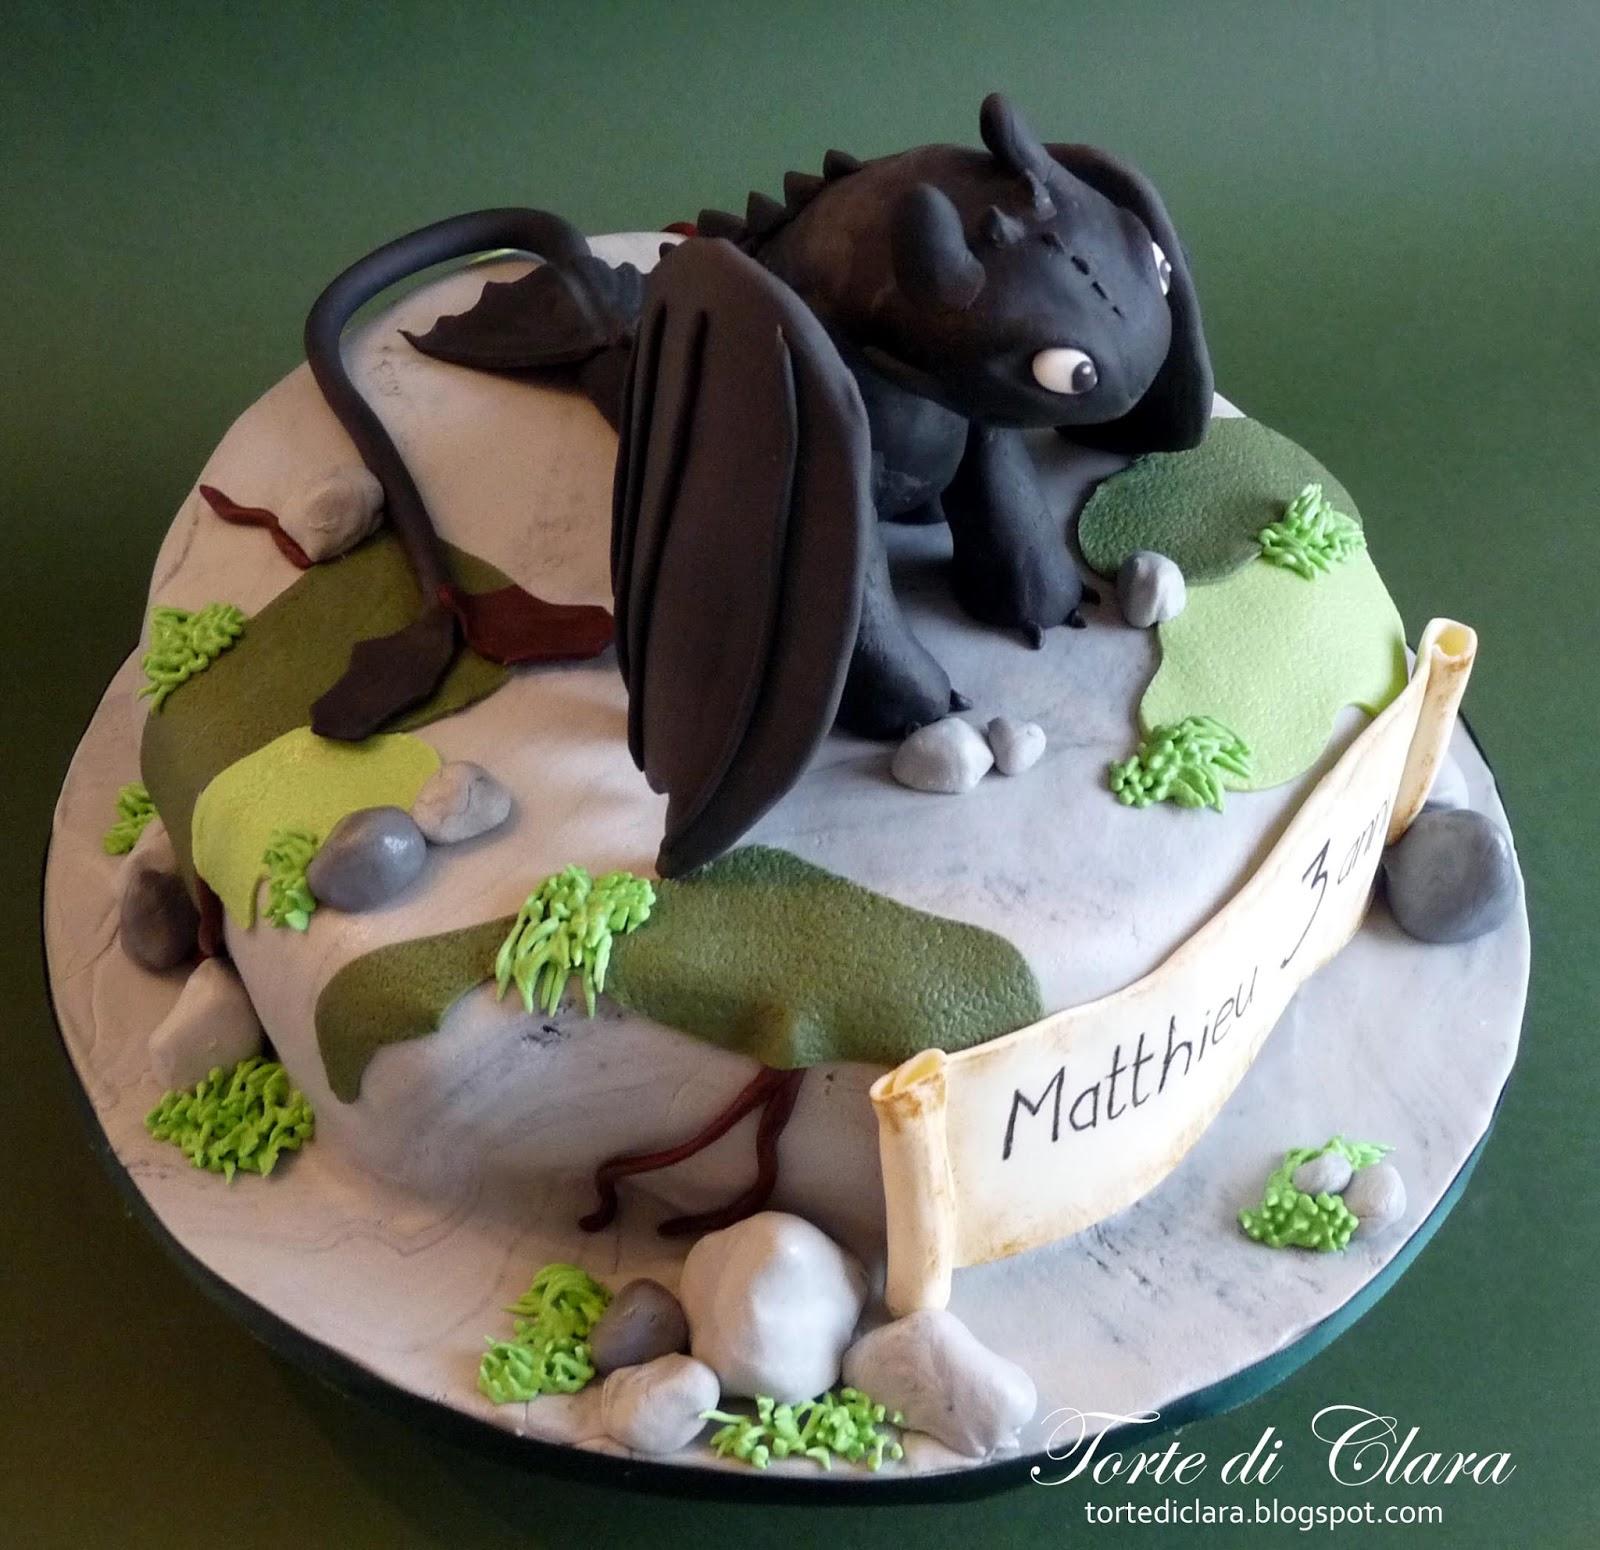 Cake Design Dragon Trainer : Torte di Clara: Dragon Trainer Cake